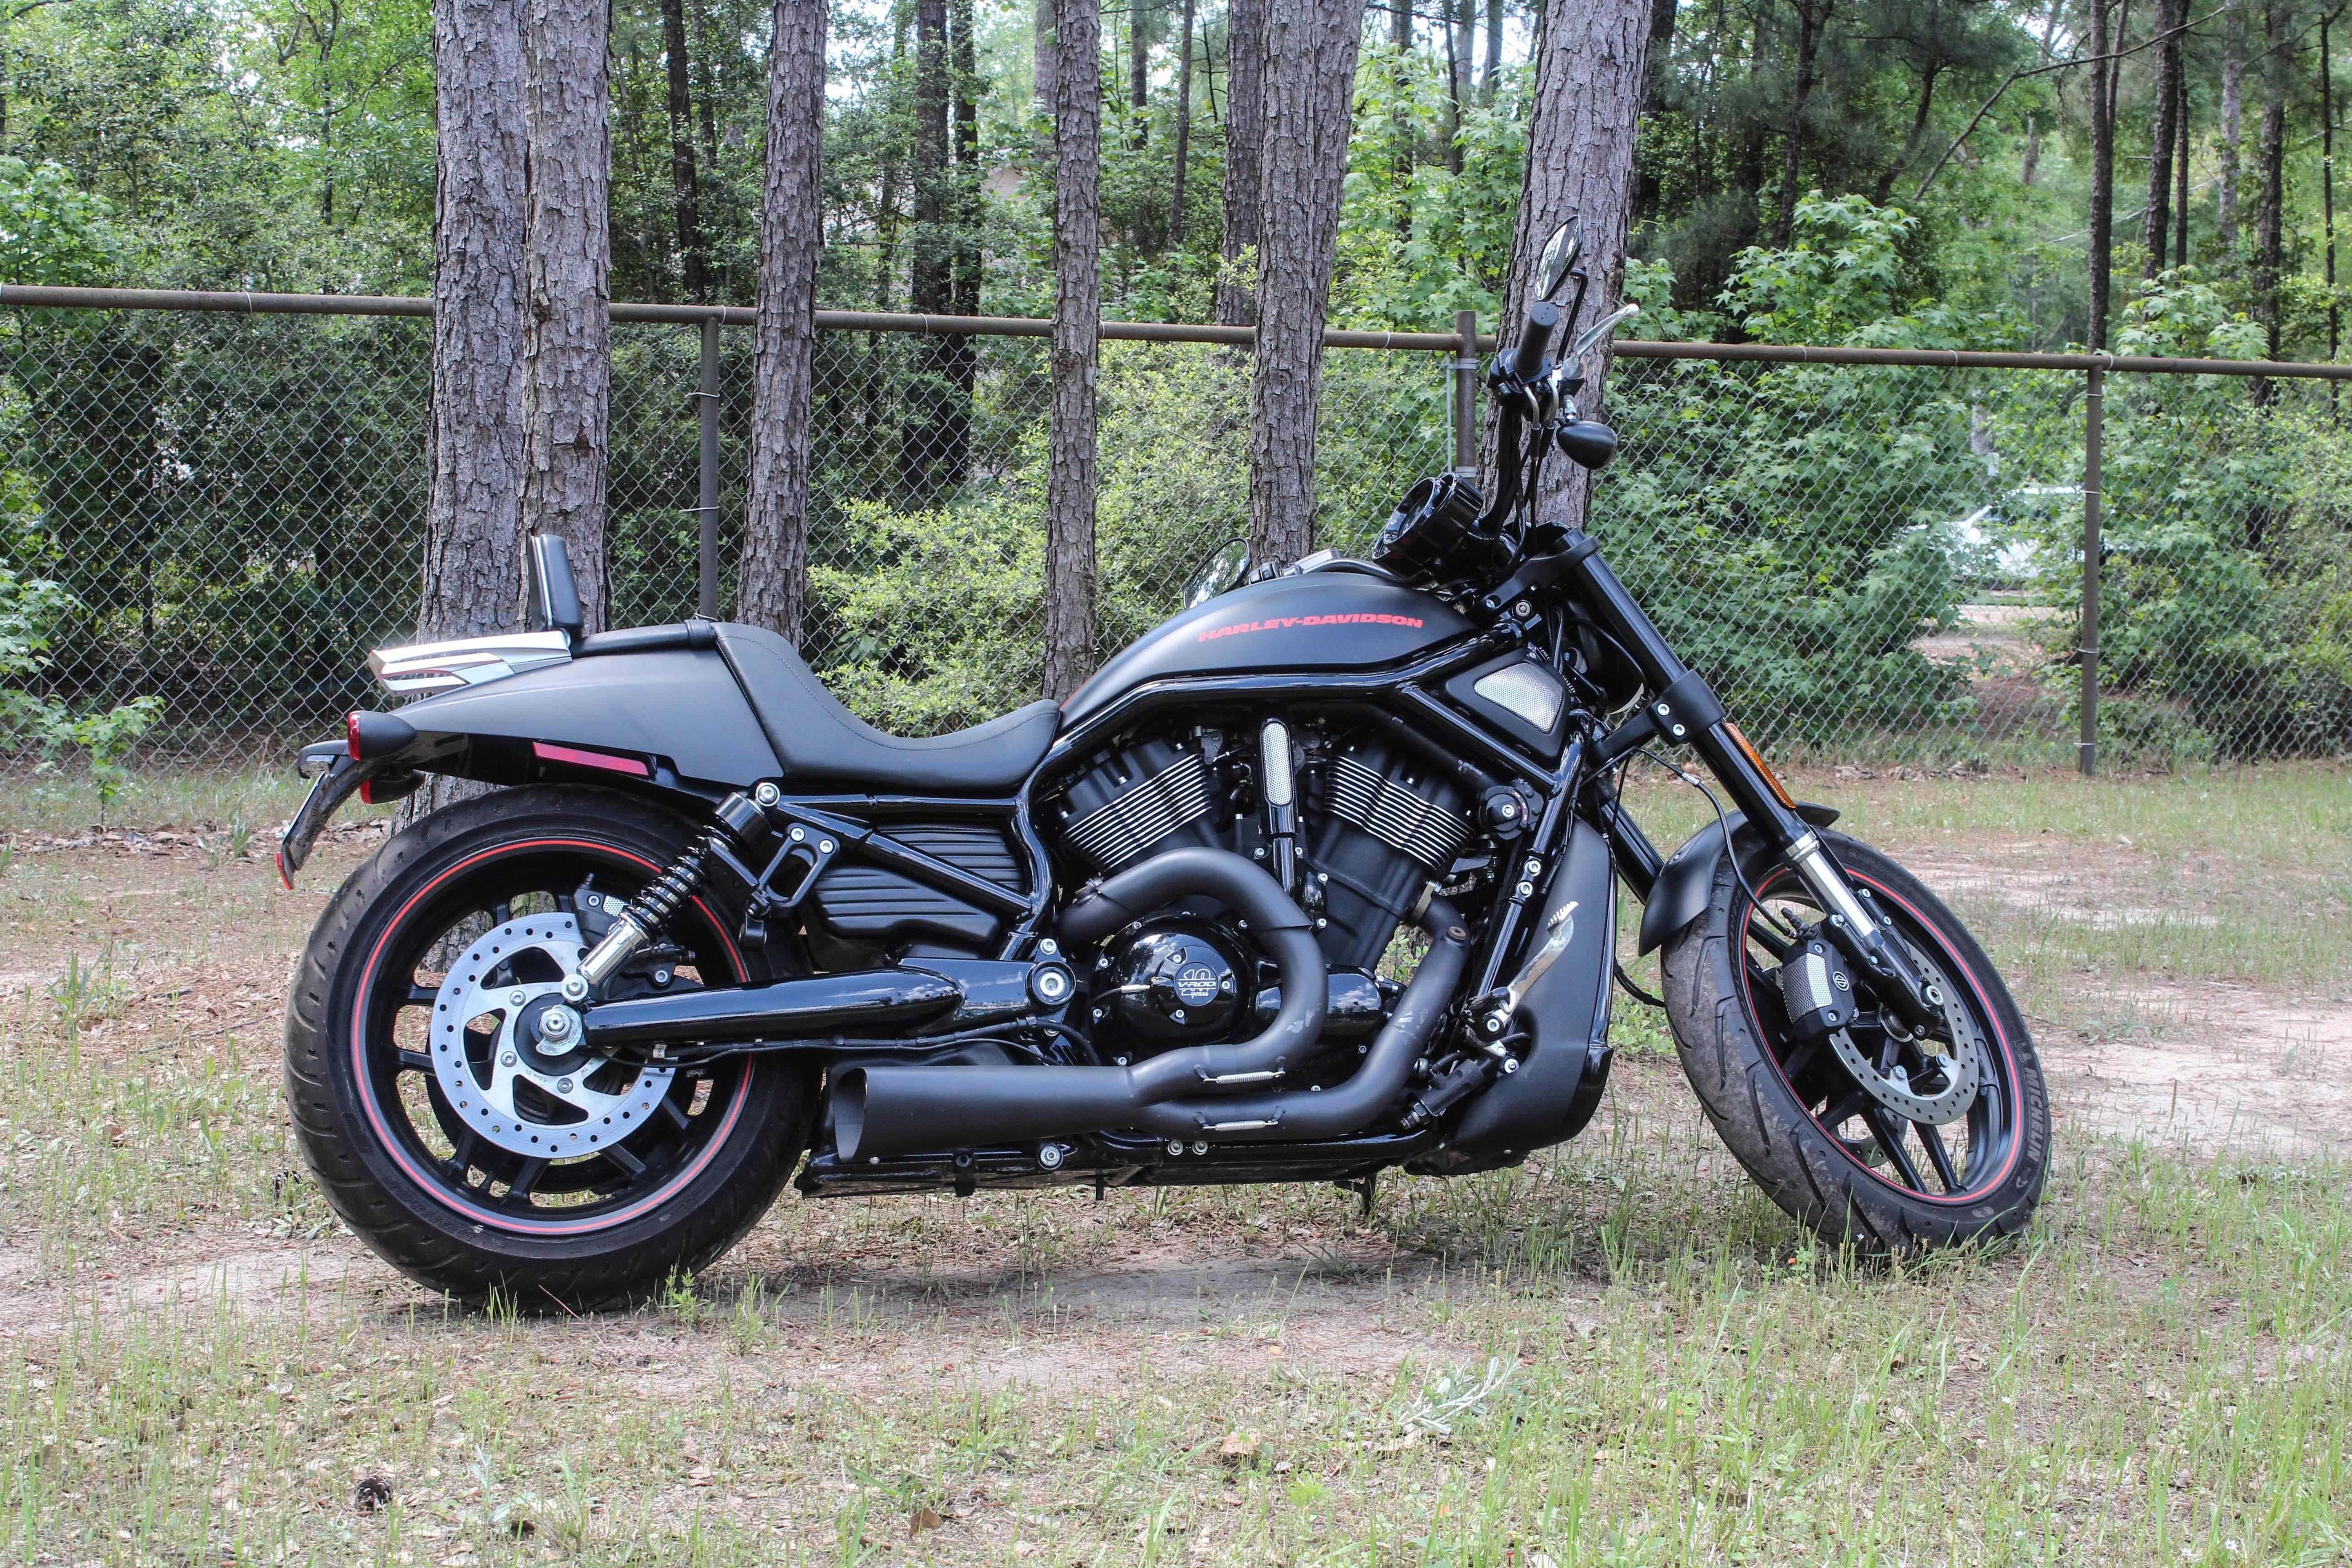 2012 Harley Davidson Vrscdx Night Rod Special: 2012 Harley-Davidson® VRSCDX V-Rod® Night Rod® Special